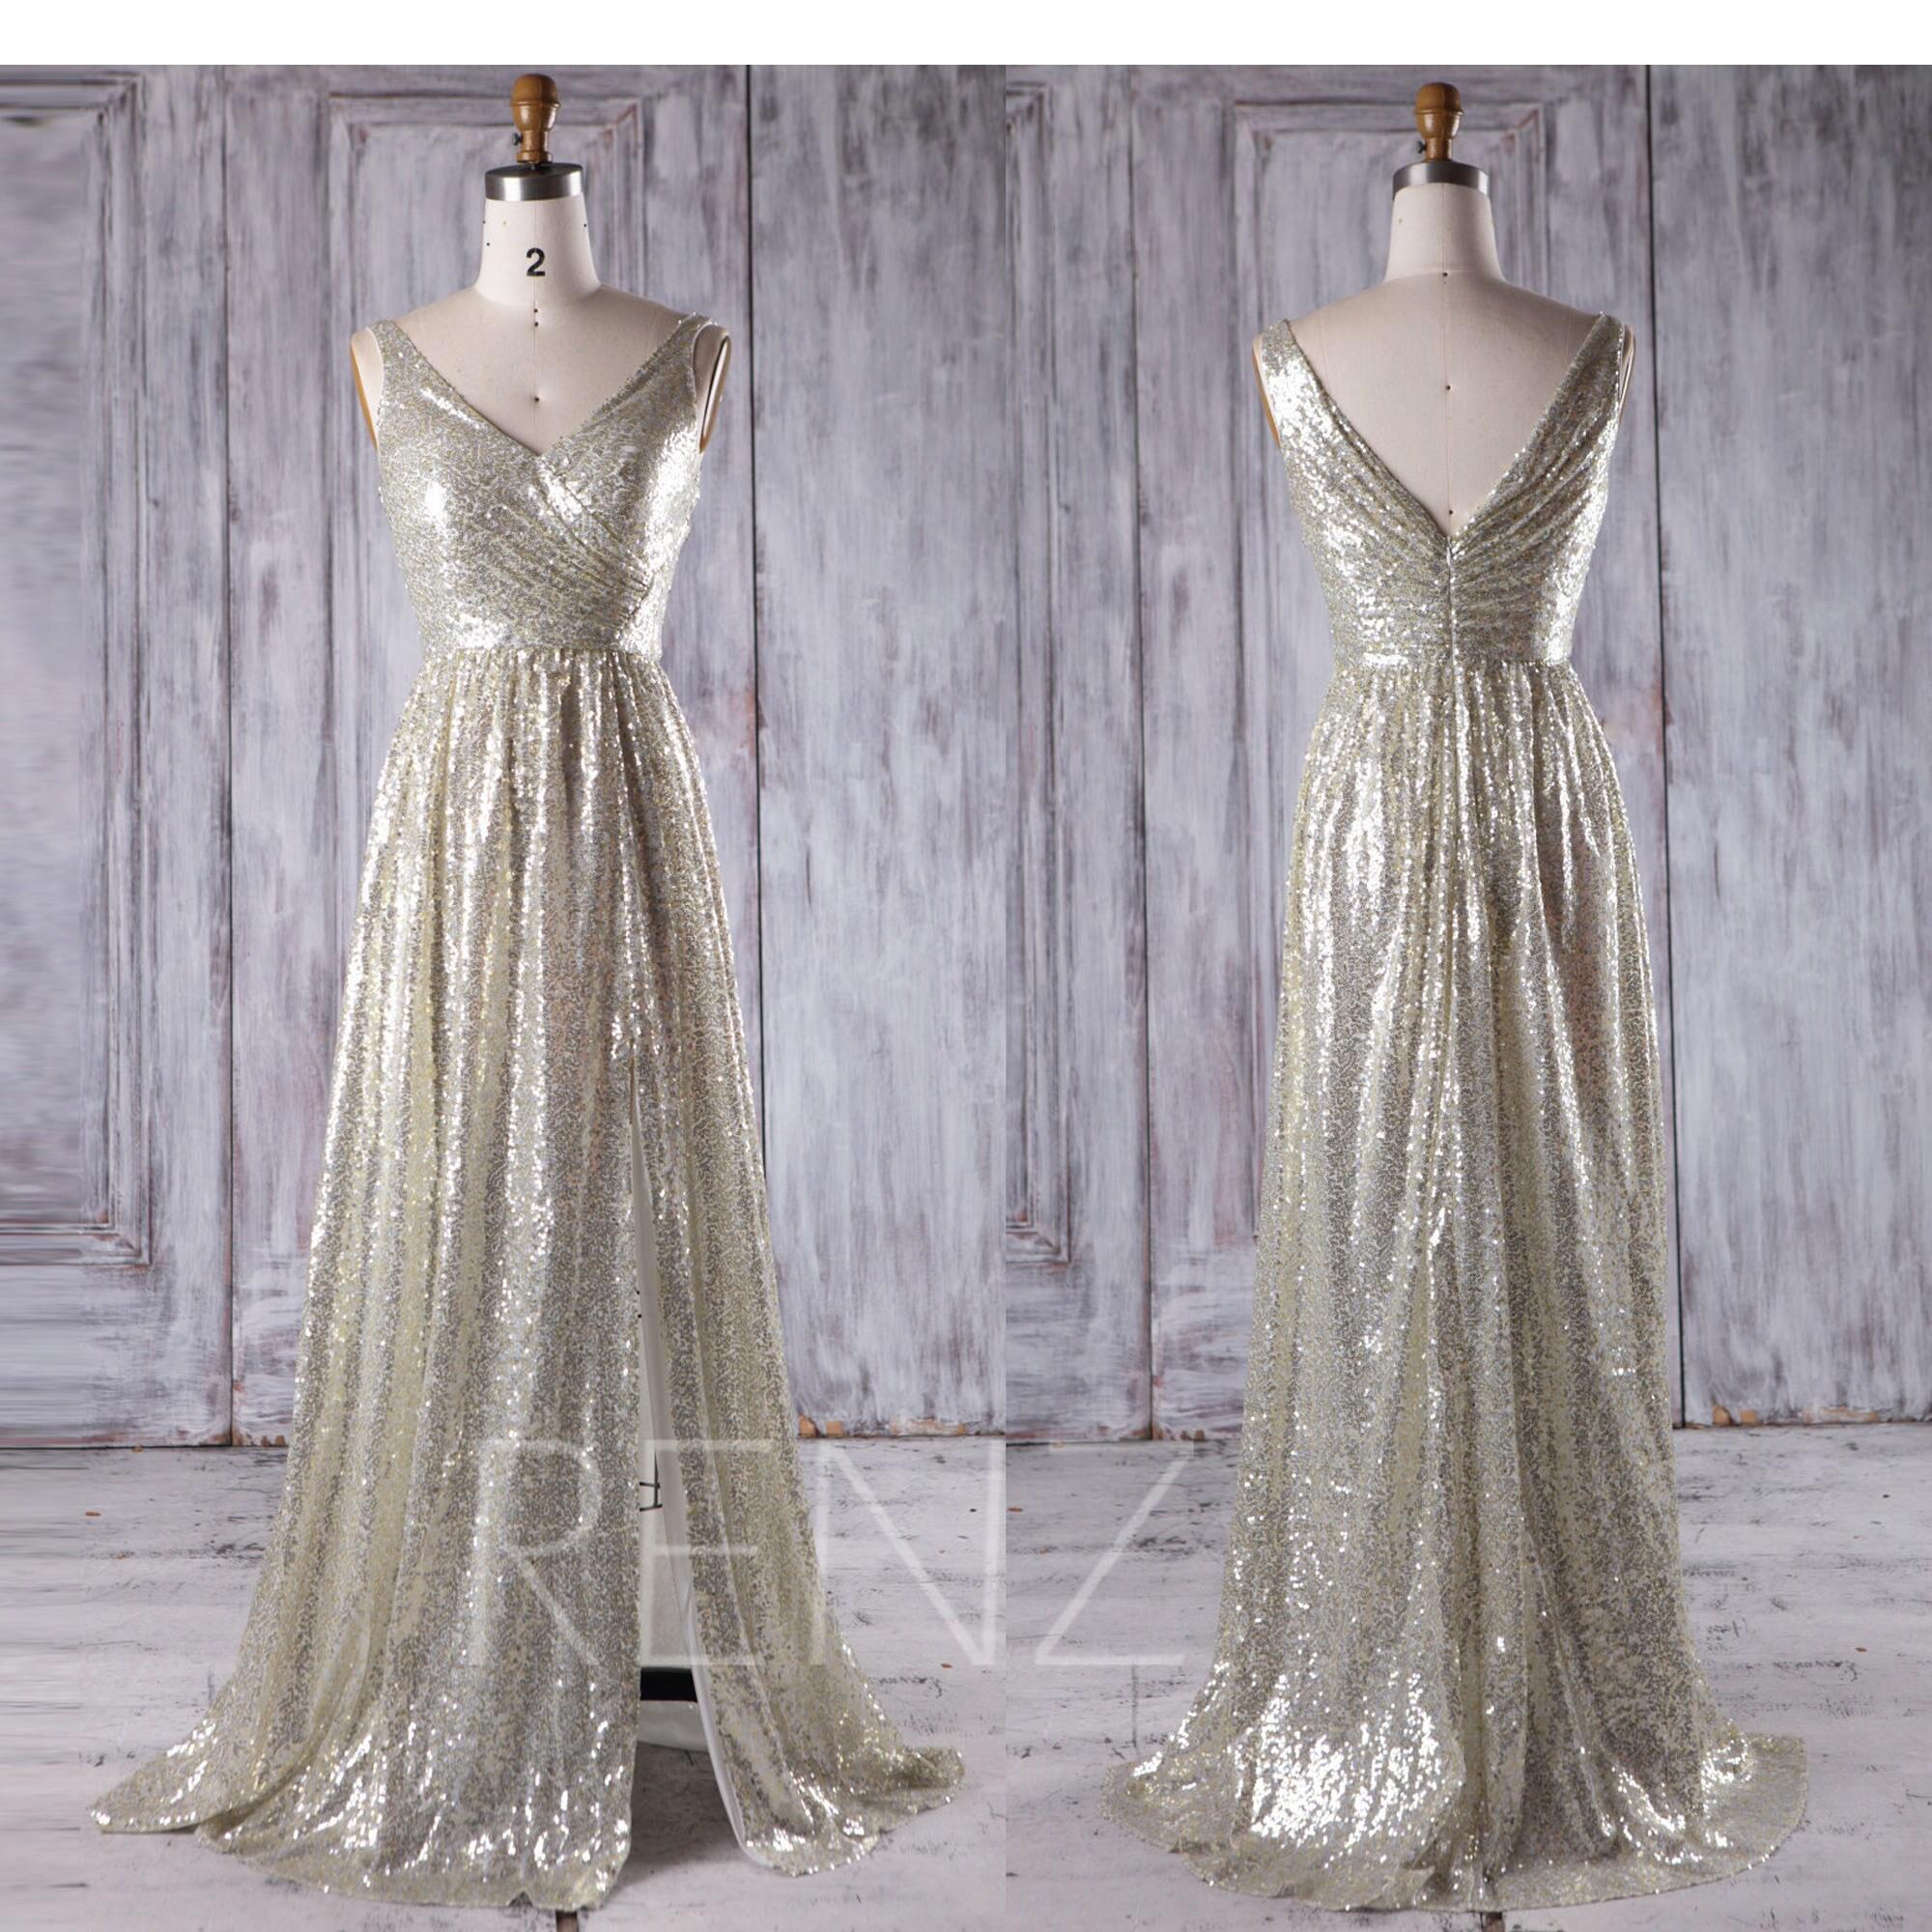 Sequin Wedding Dress: 2017 Gold Silver Sequin Bridesmaid Dress Slit V Neck Wedding